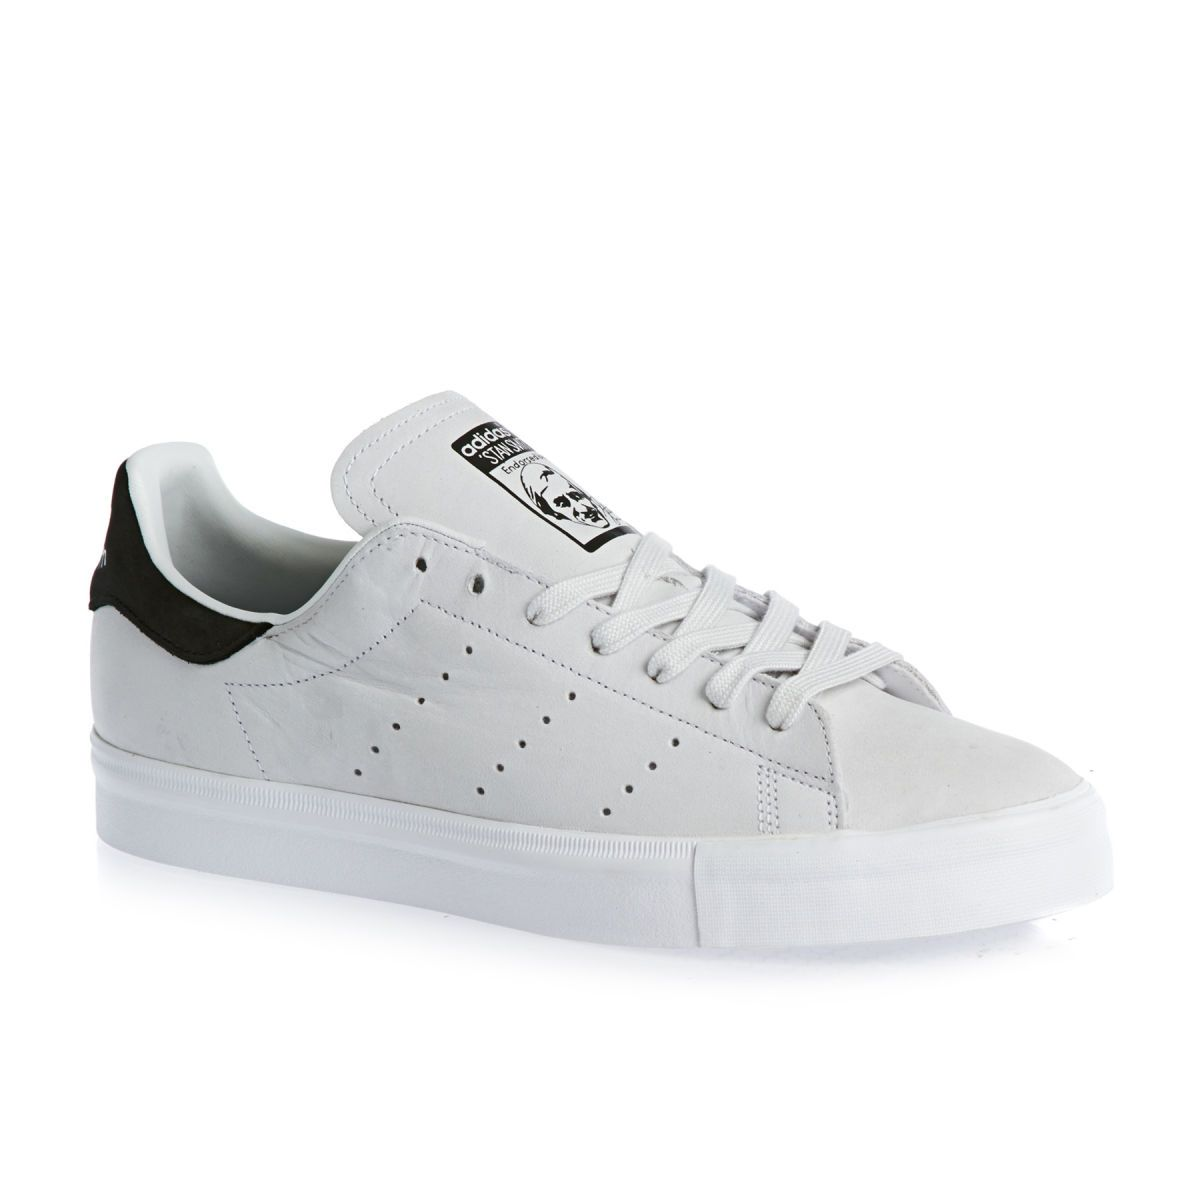 adidas originals stan smith vulc navy /white pumps shoes